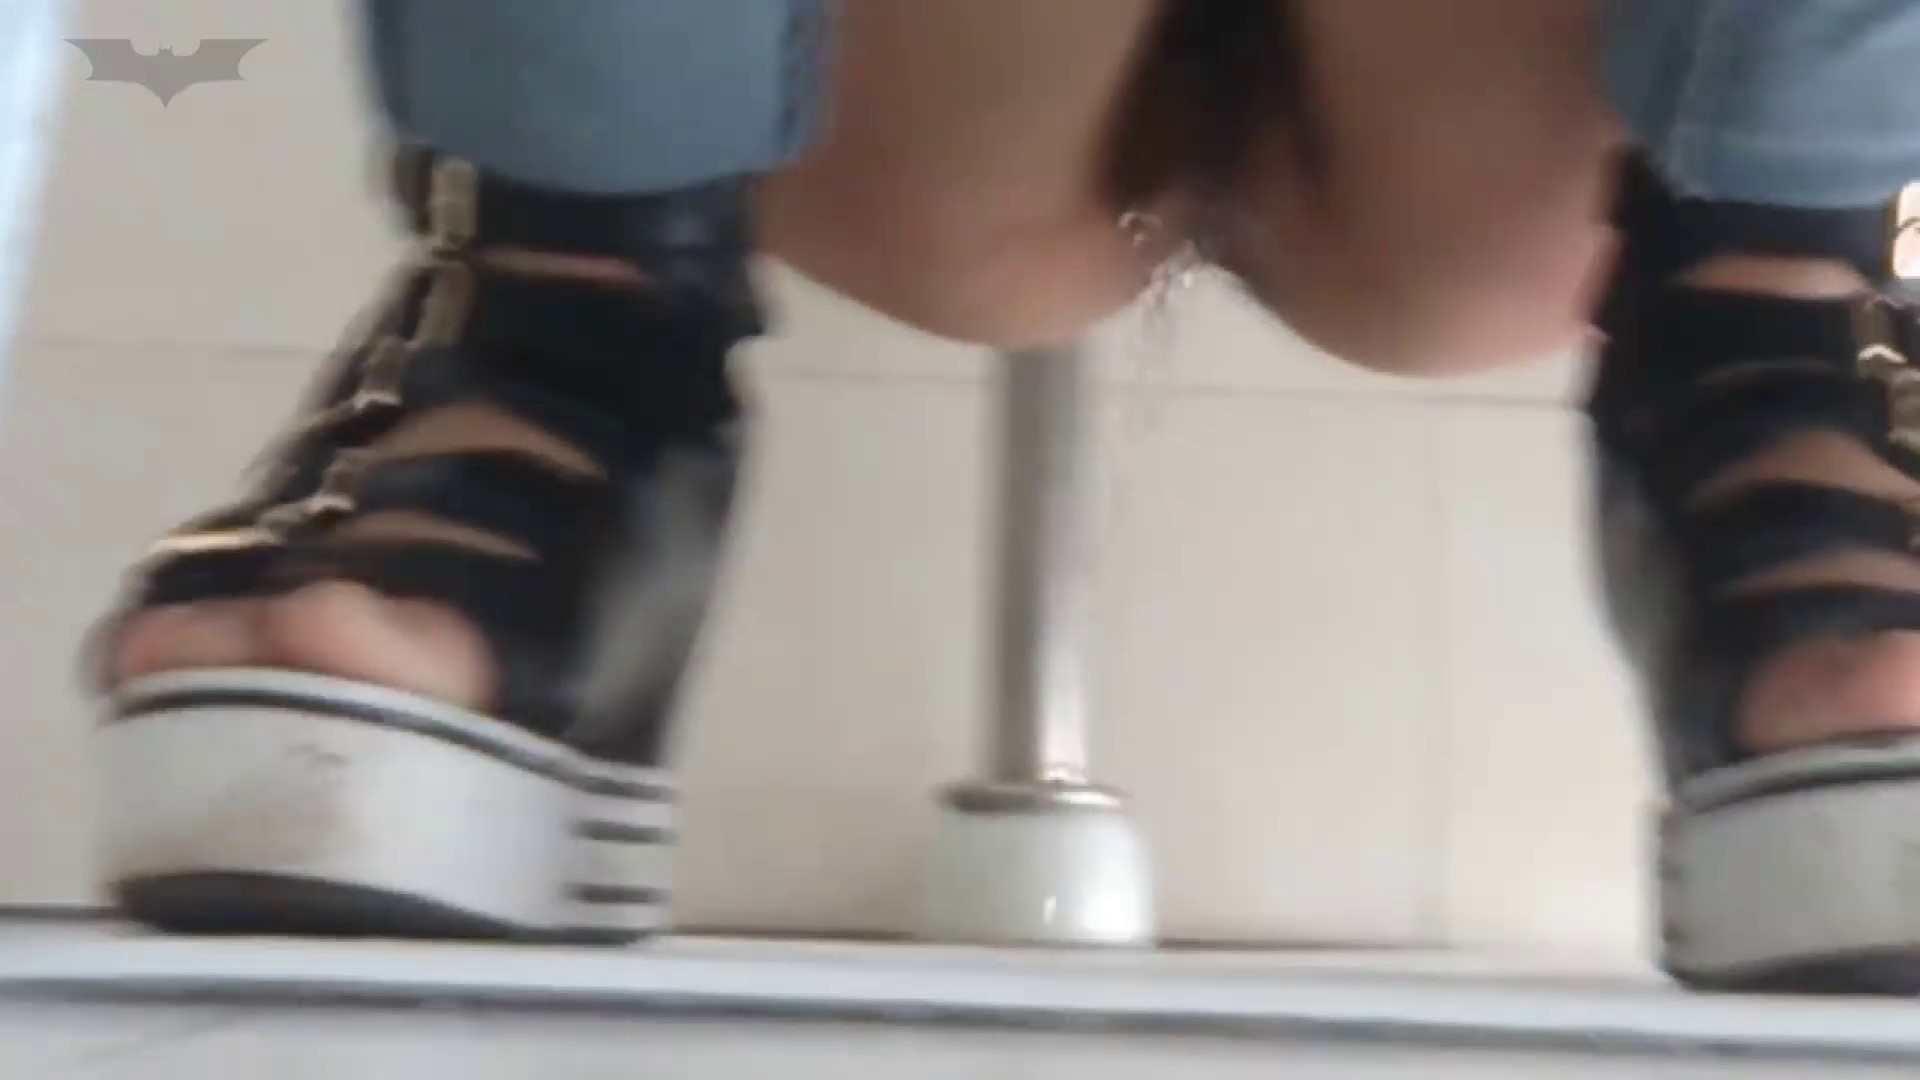 JD盗撮 美女の洗面所の秘密 Vol.37 ギャル達 AV動画キャプチャ 112枚 42